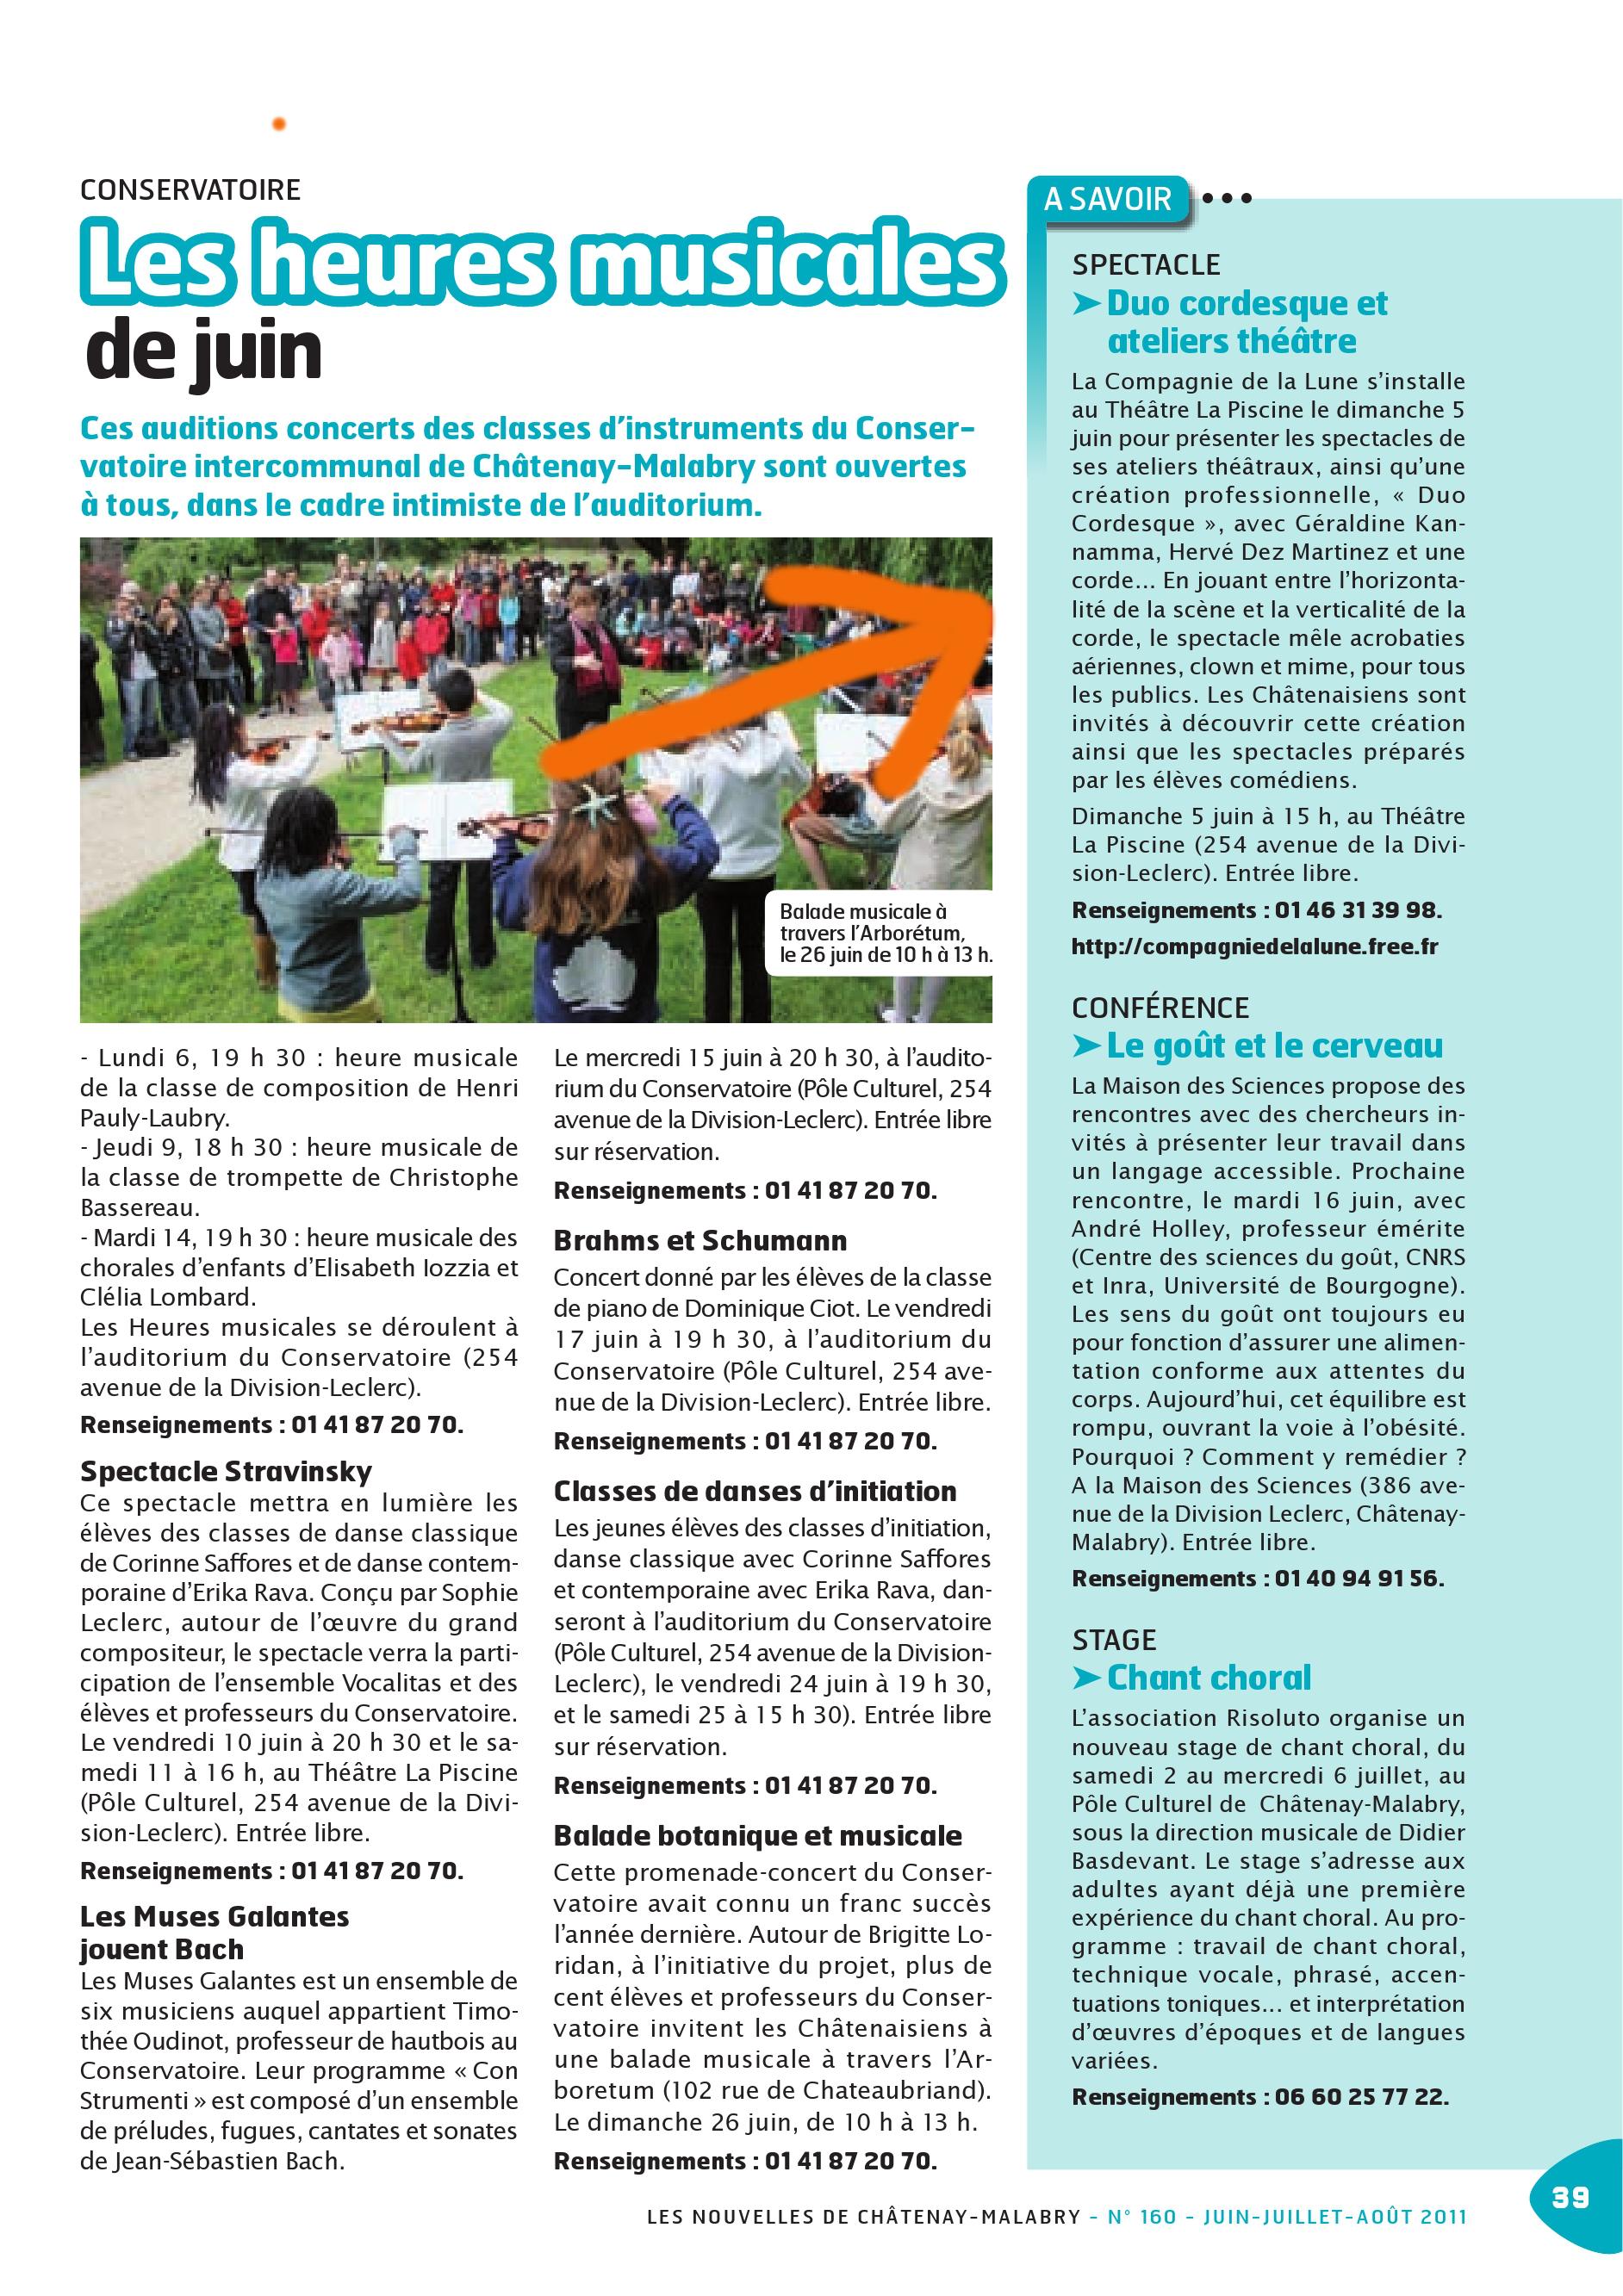 Article DUO 5 Juin 2011